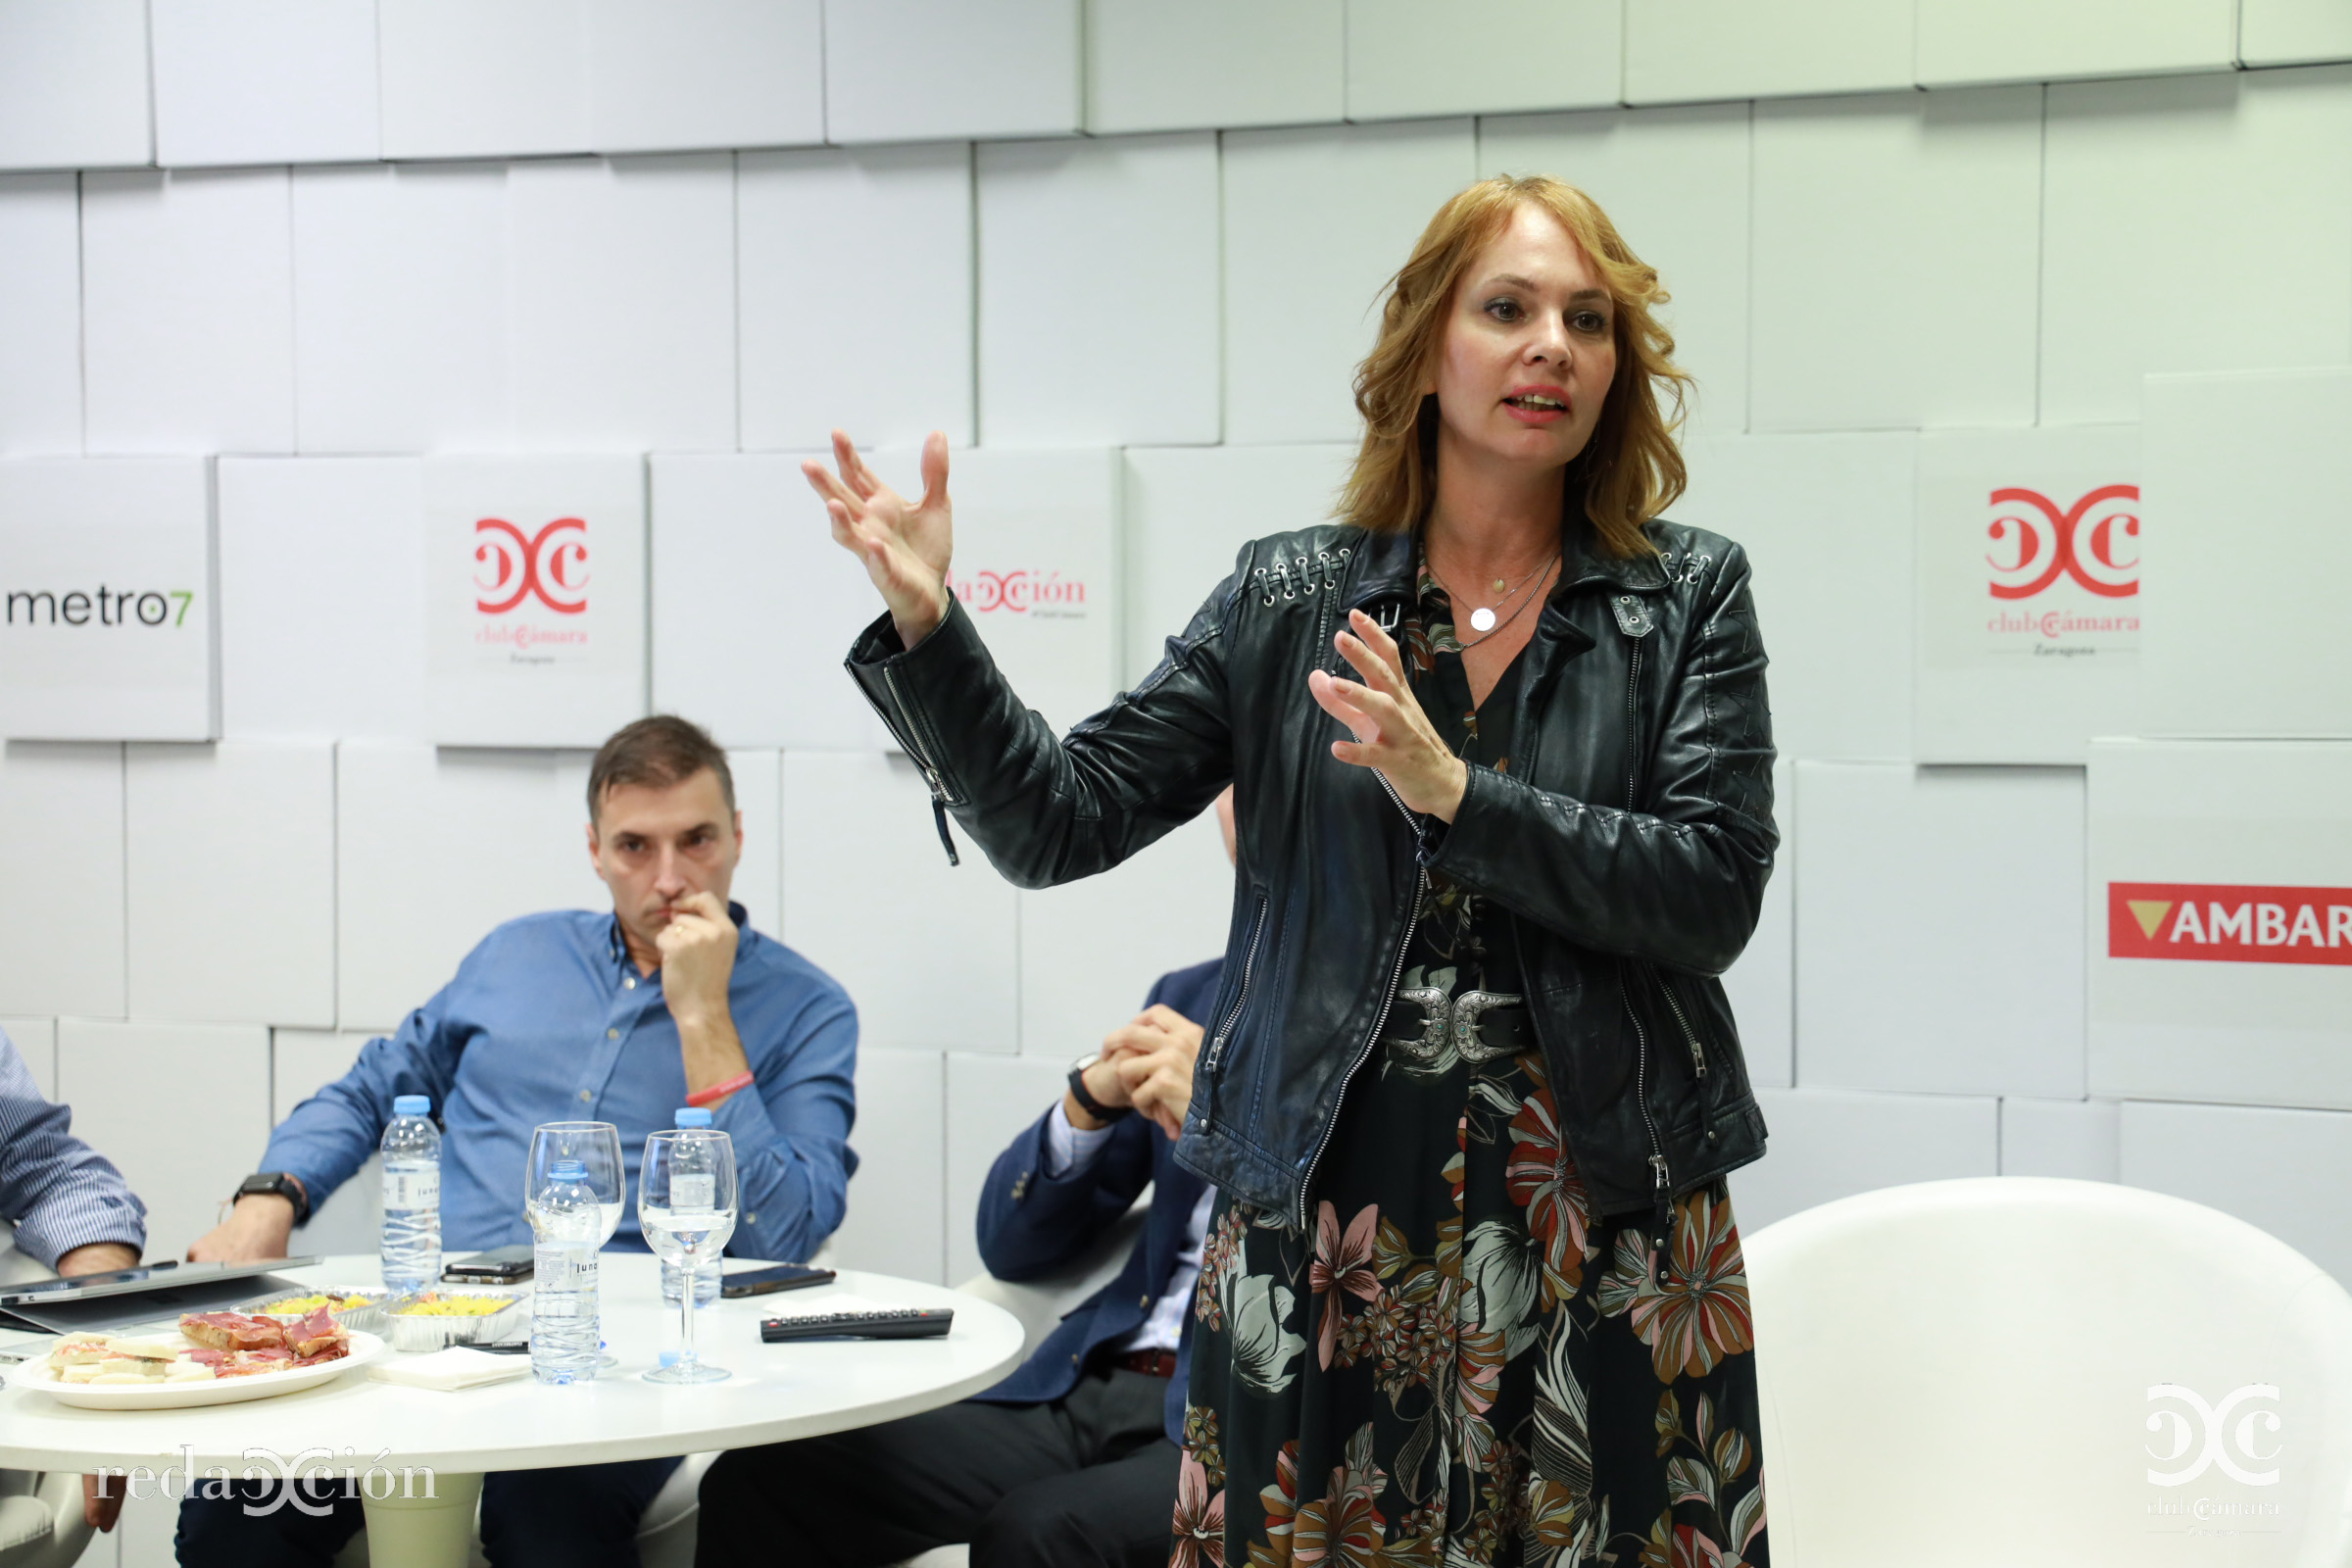 Carmen Herrarte, T-ZIR